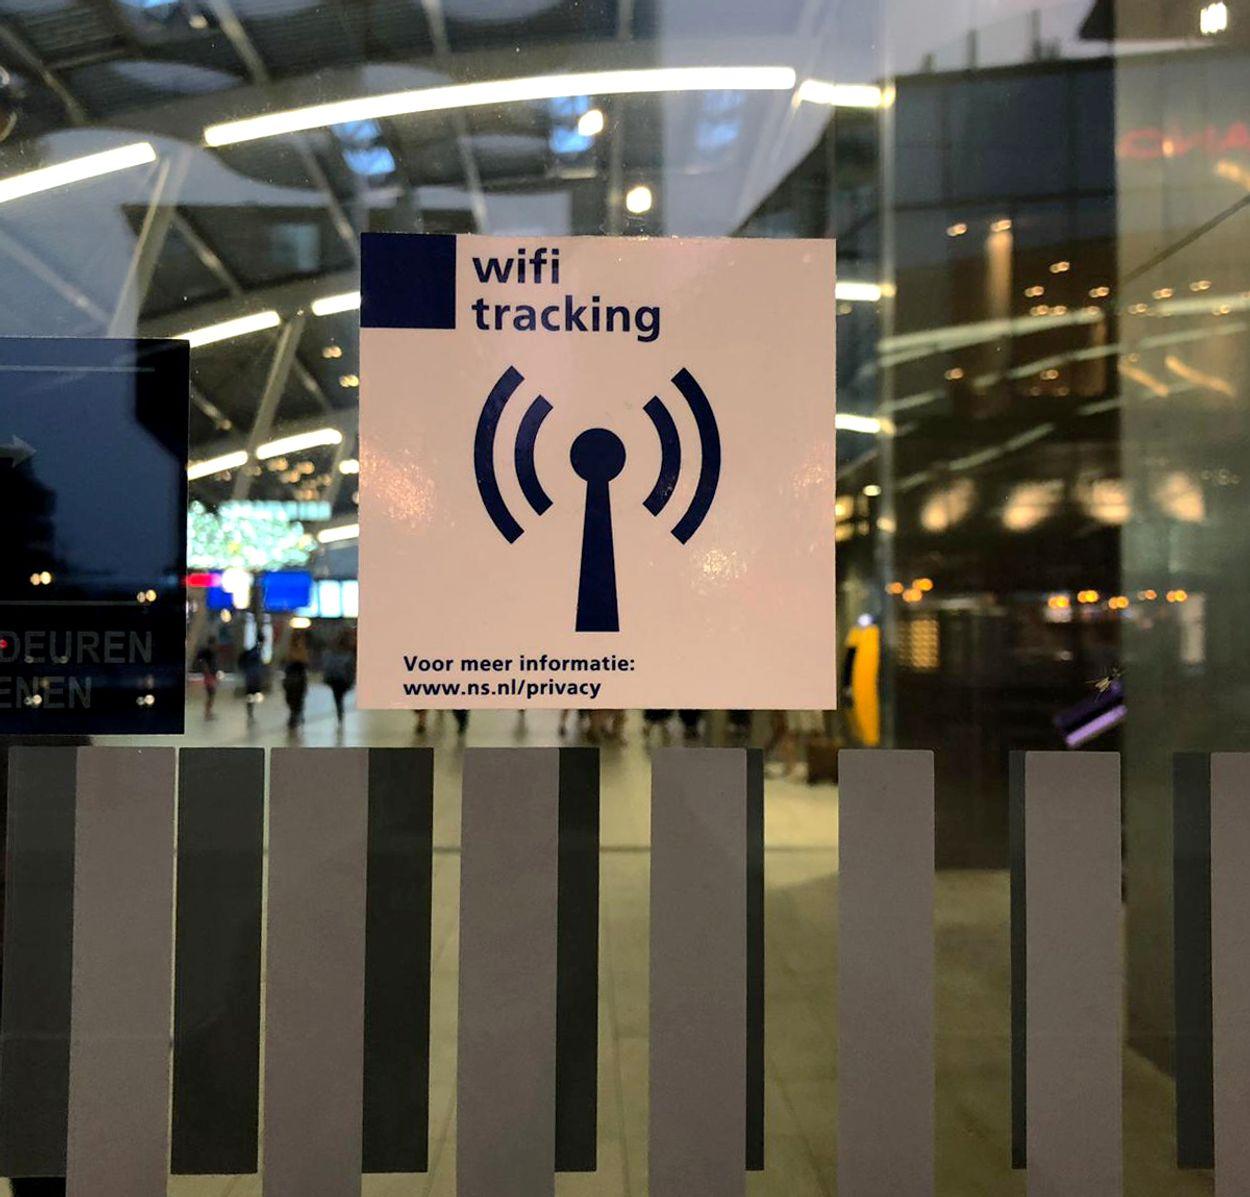 wifi-tracking Utrecht Centraal